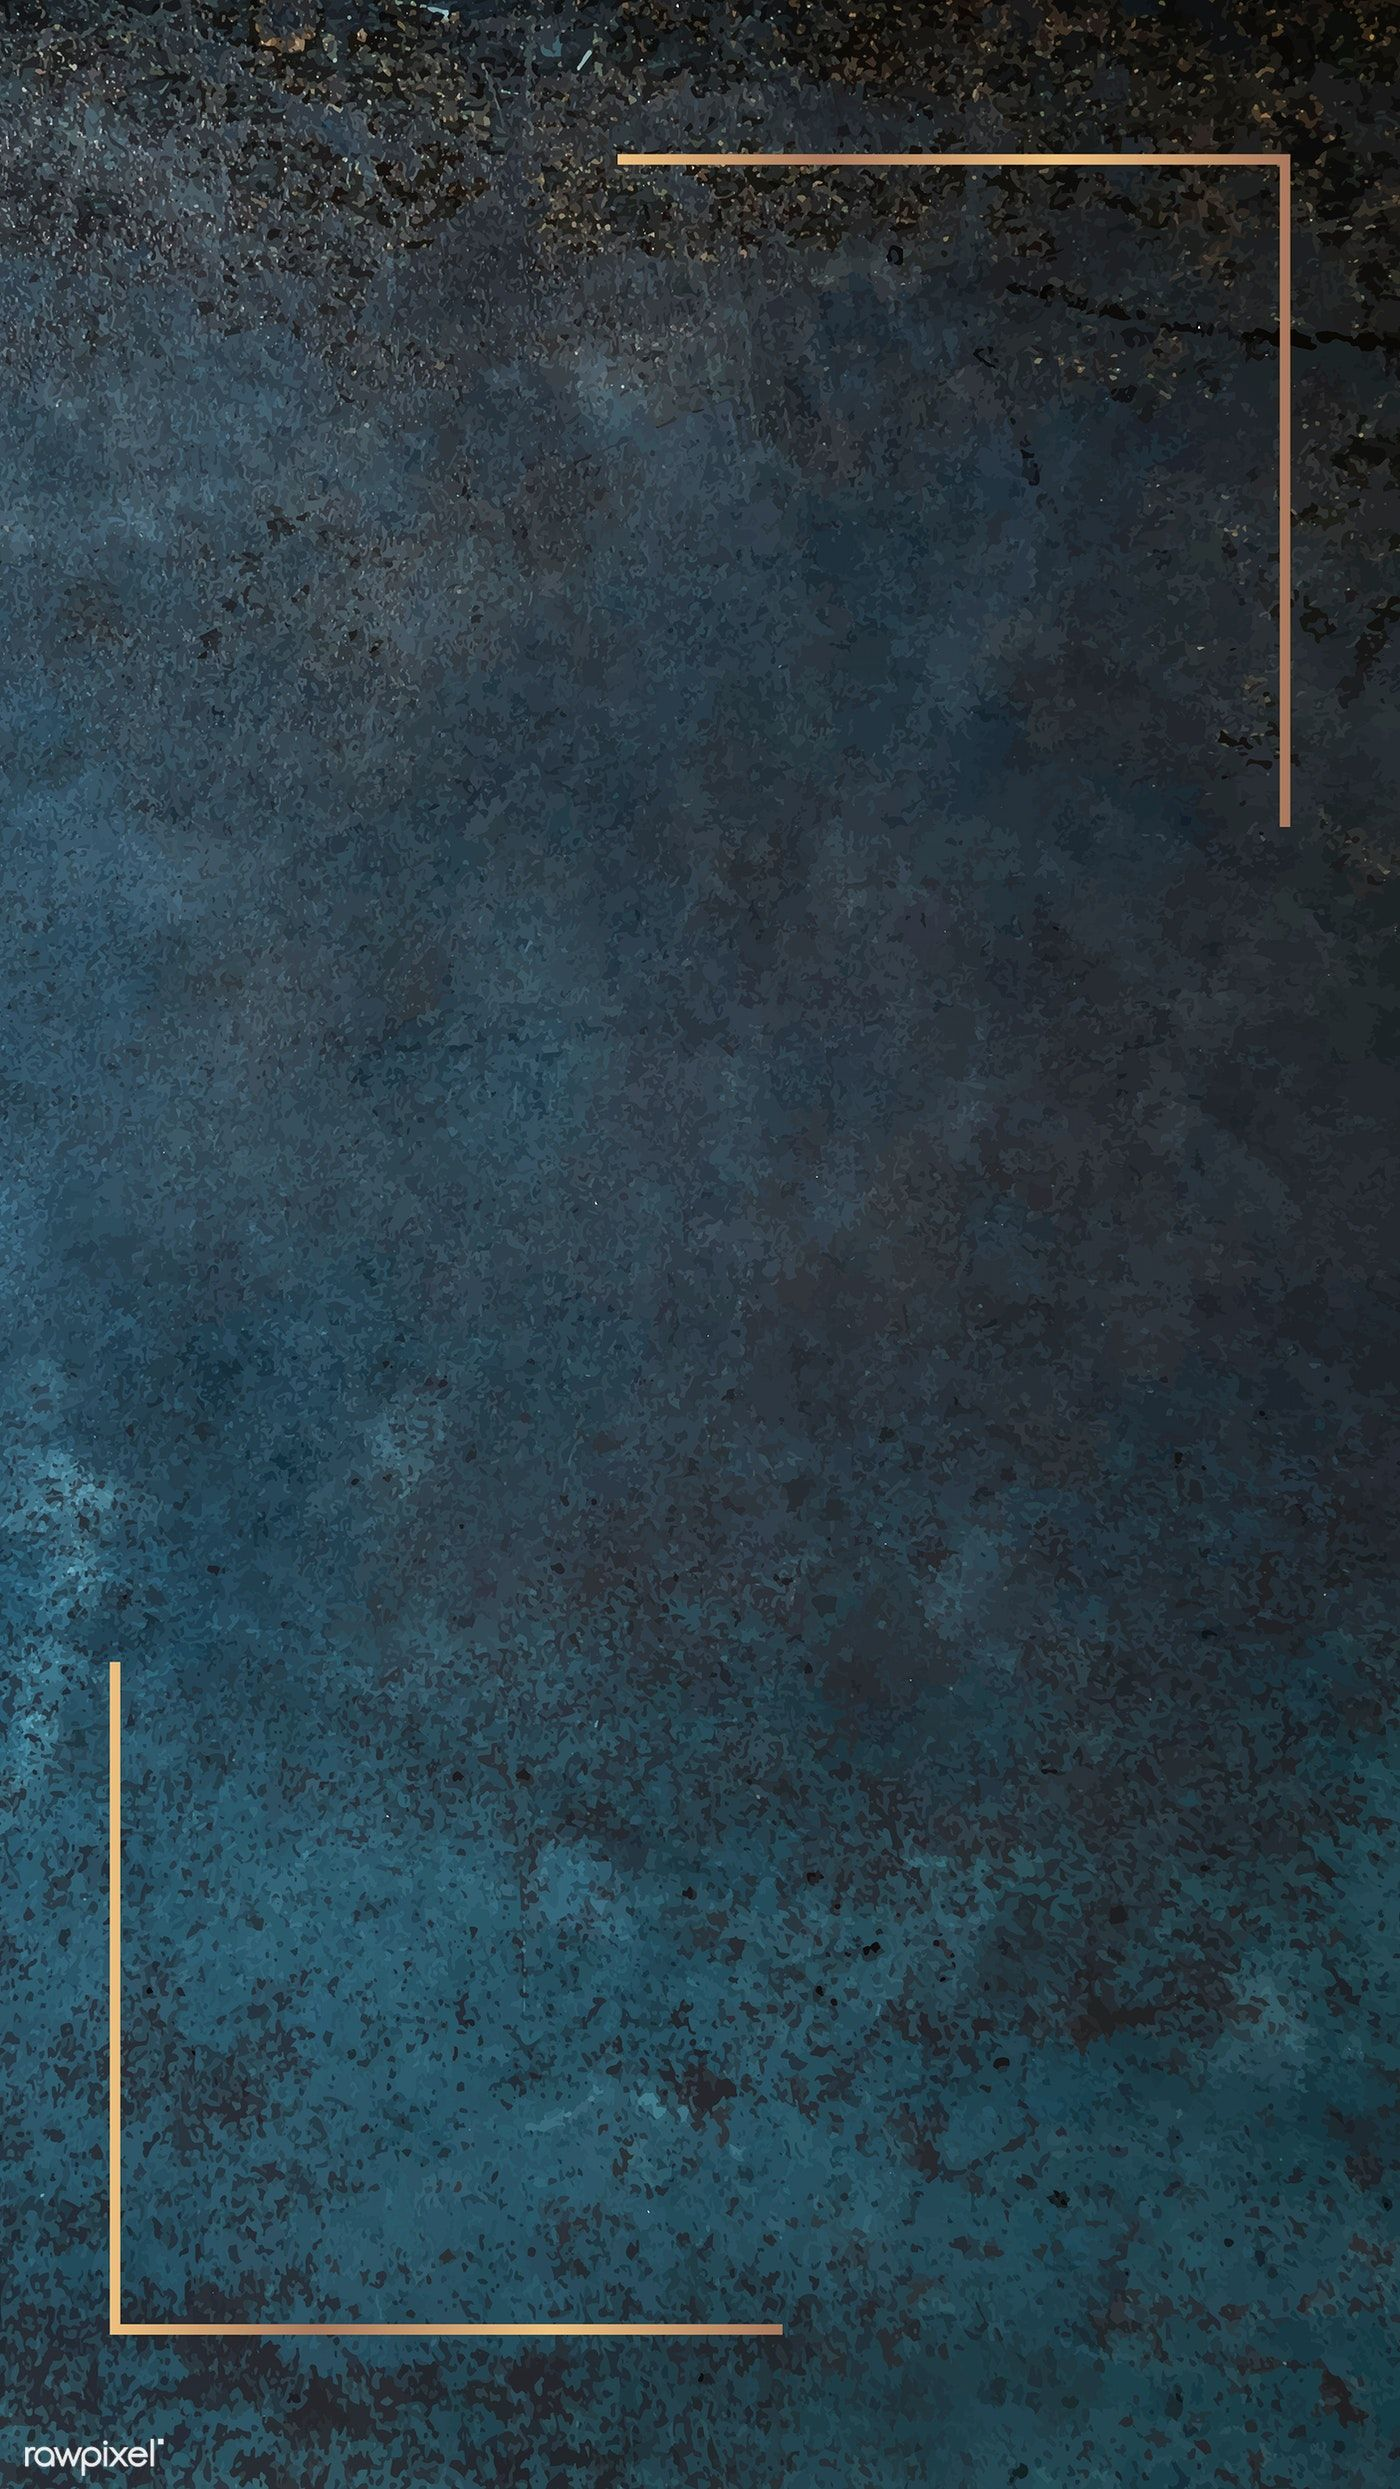 Download Premium Vector Of Gold Frame On Grunge Blue Mobile Phone Framed Wallpaper Phone Wallpaper Images Perfect Wallpaper